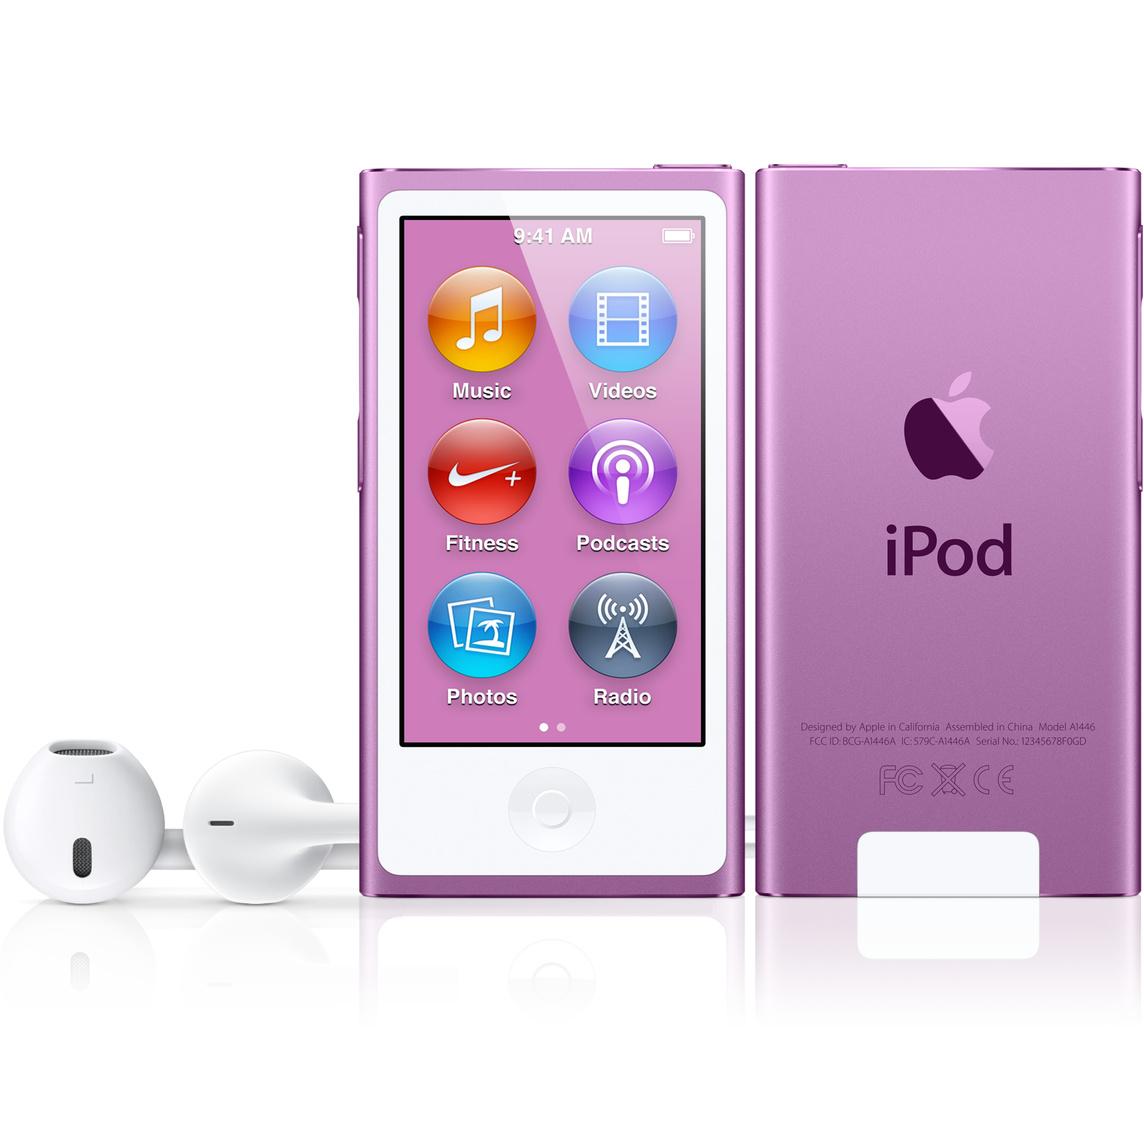 Refurbished iPod nano 16GB - Purple (7th generation)